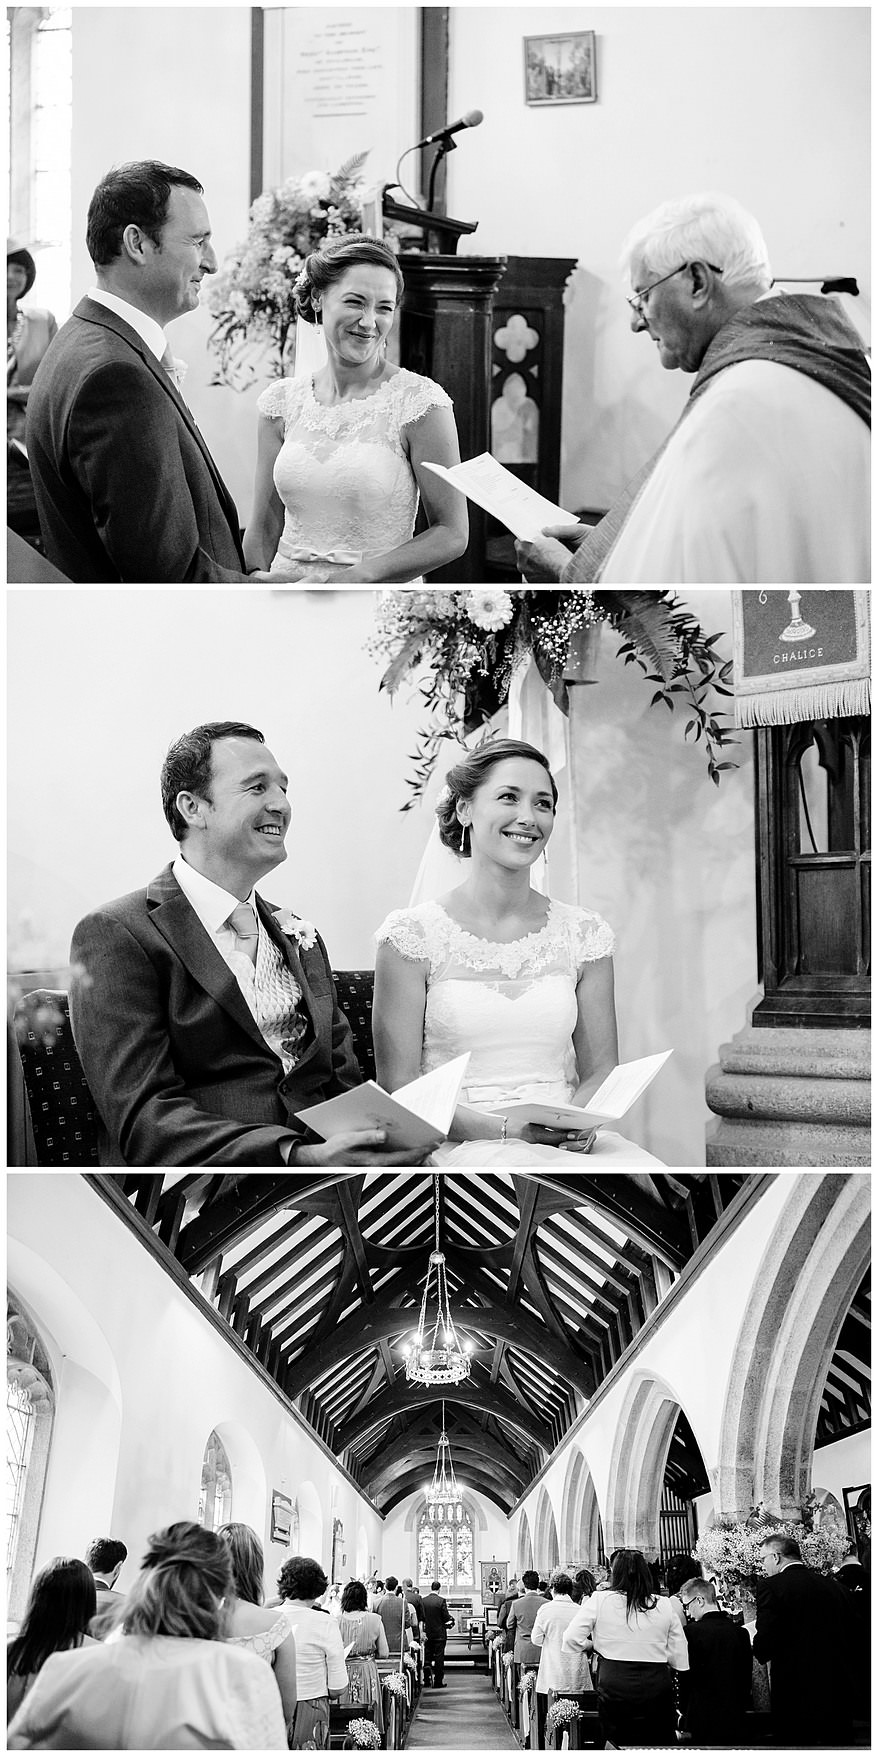 Wedding ceremony at Perranwell Church